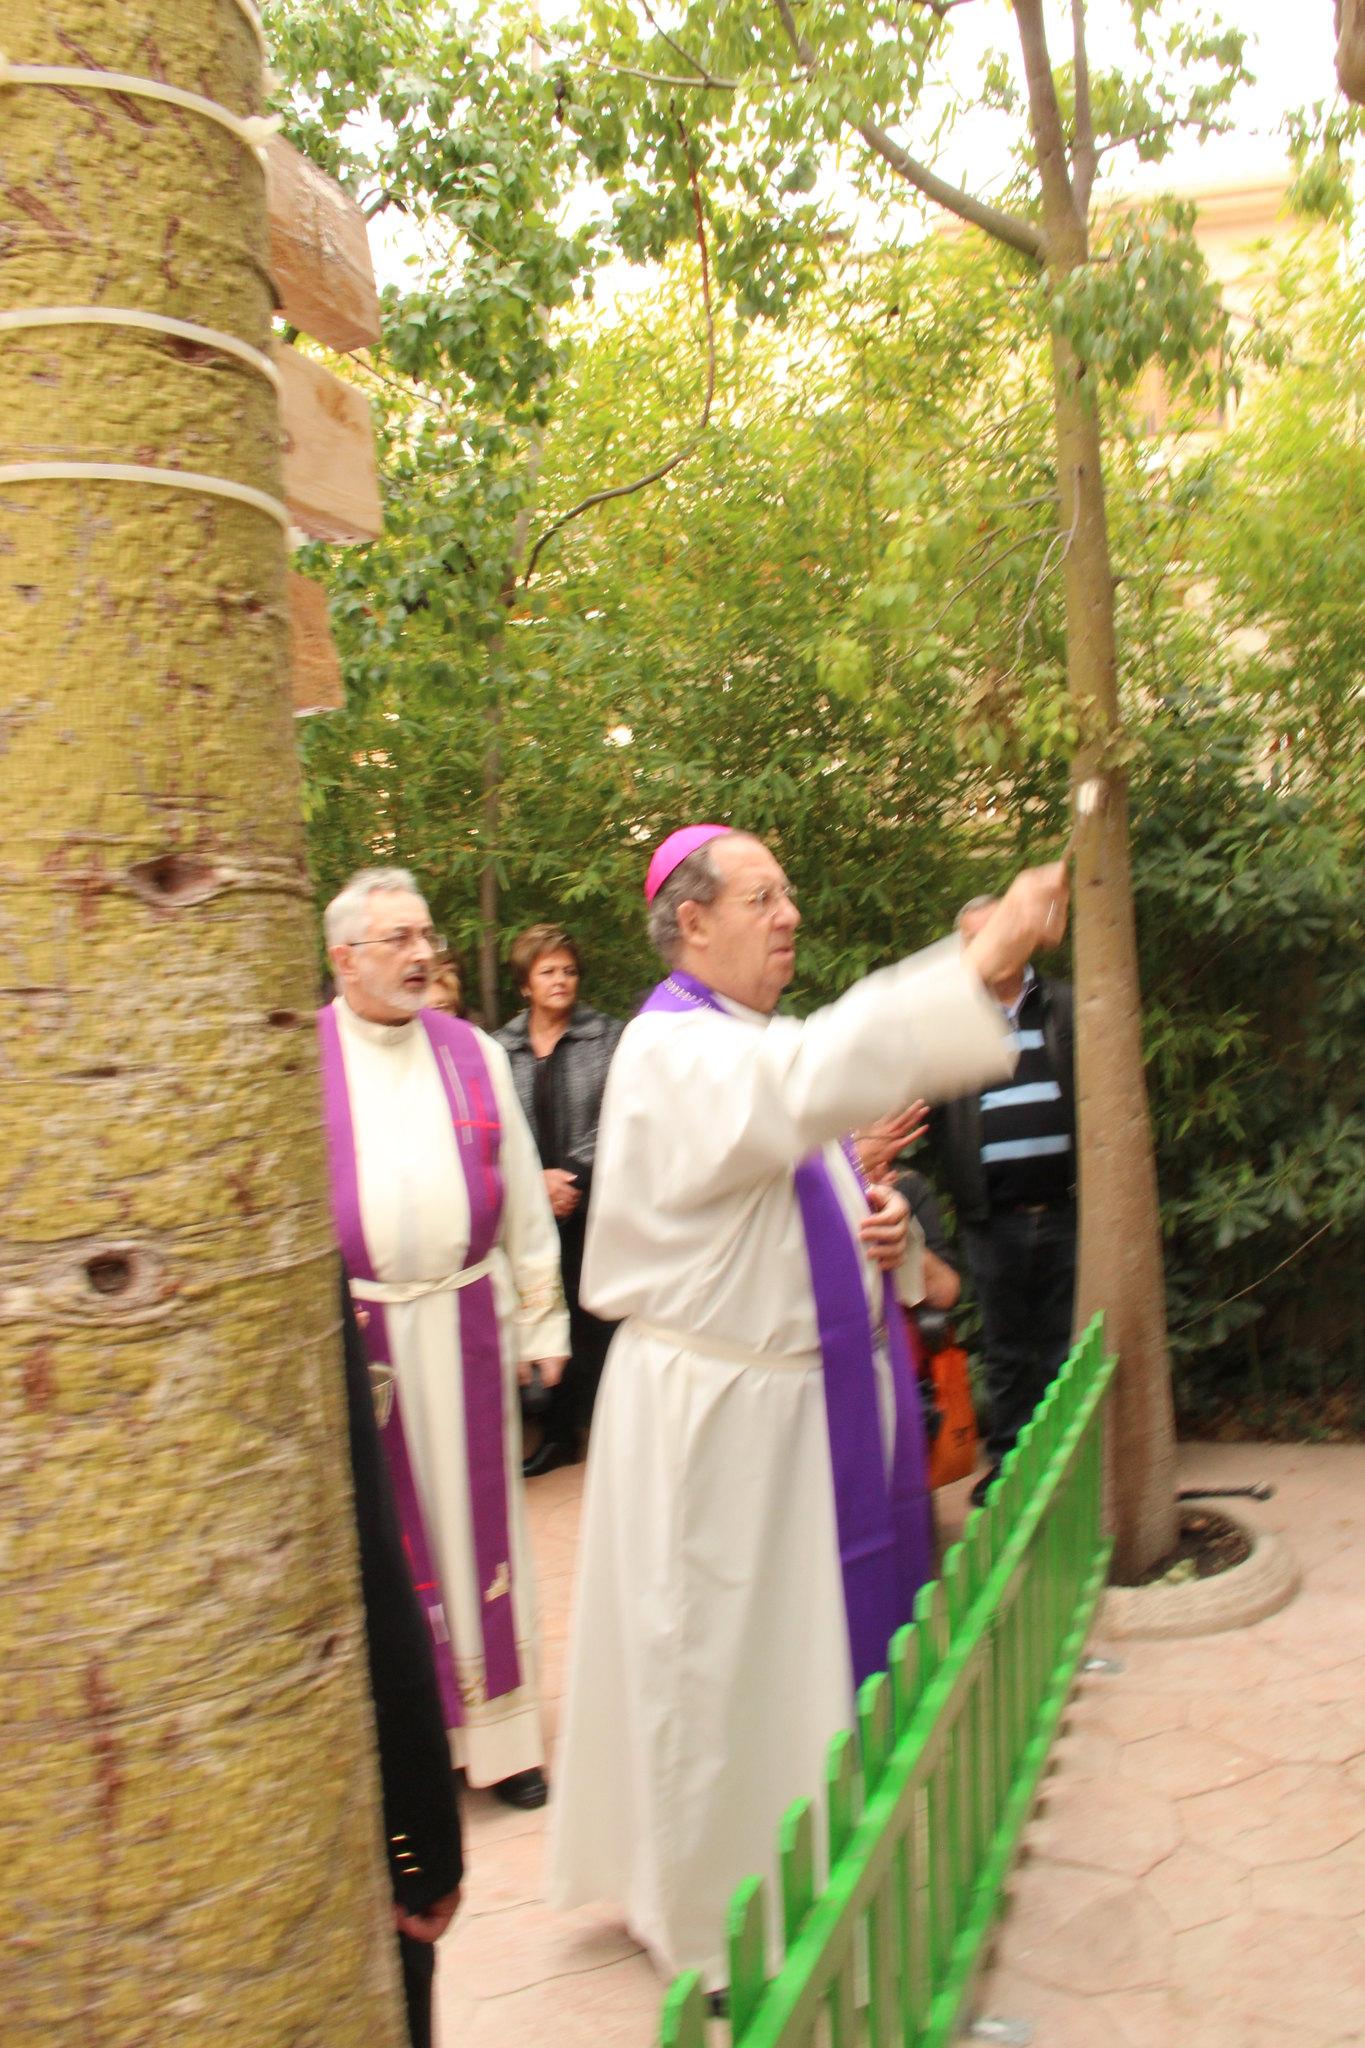 (2016-02-13) - Inauguración Virgen De Lourdes, La Molineta - Archivo La Molineta (078)